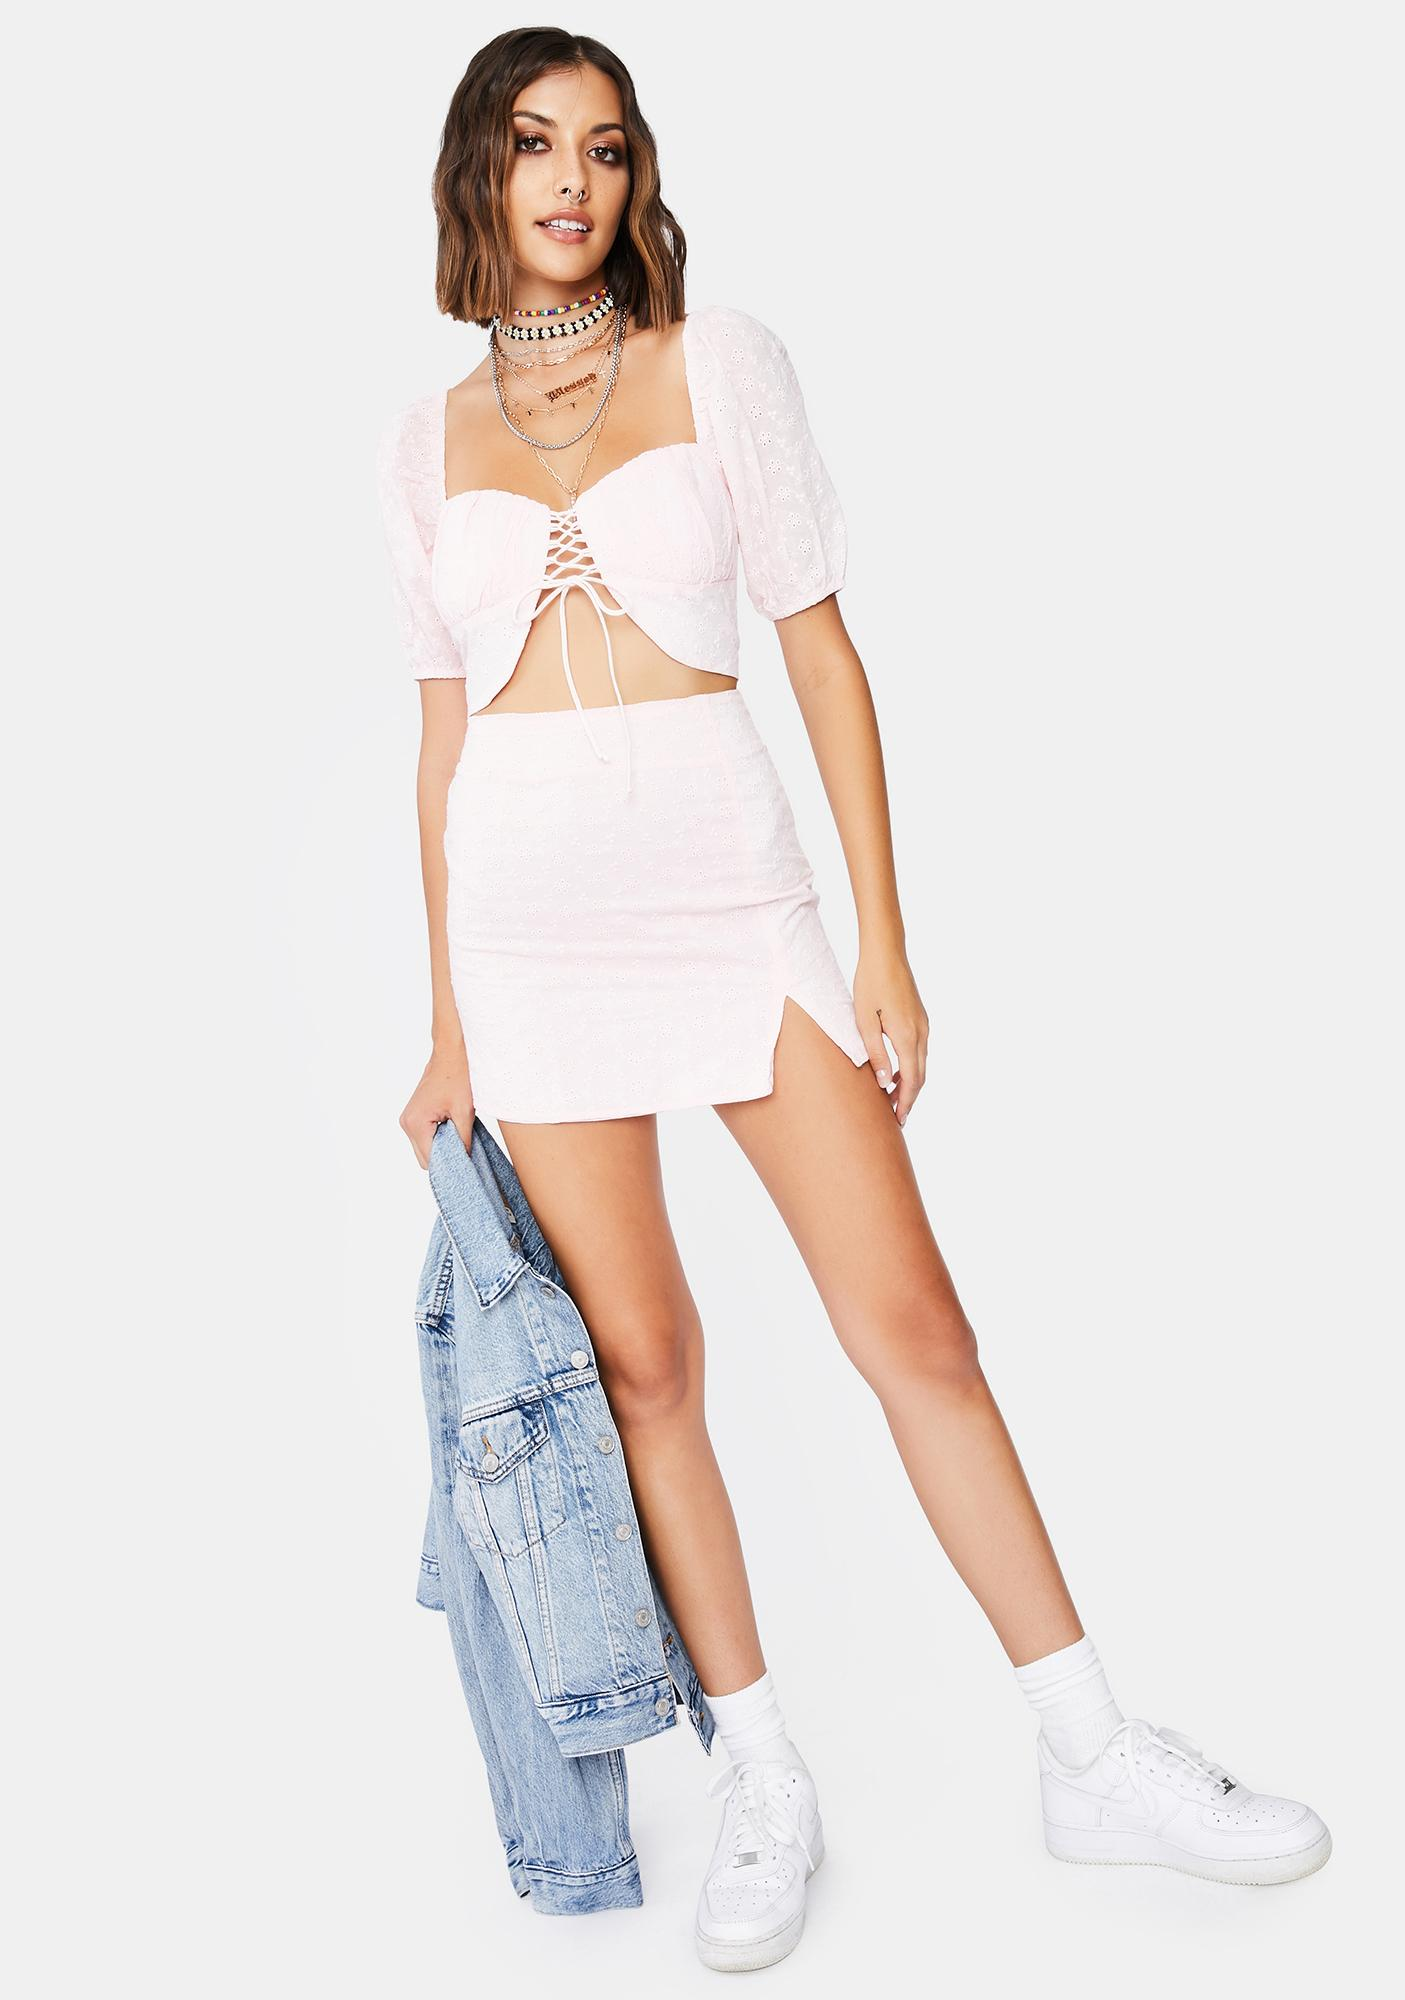 Blush Raison D'Etre Skirt Set